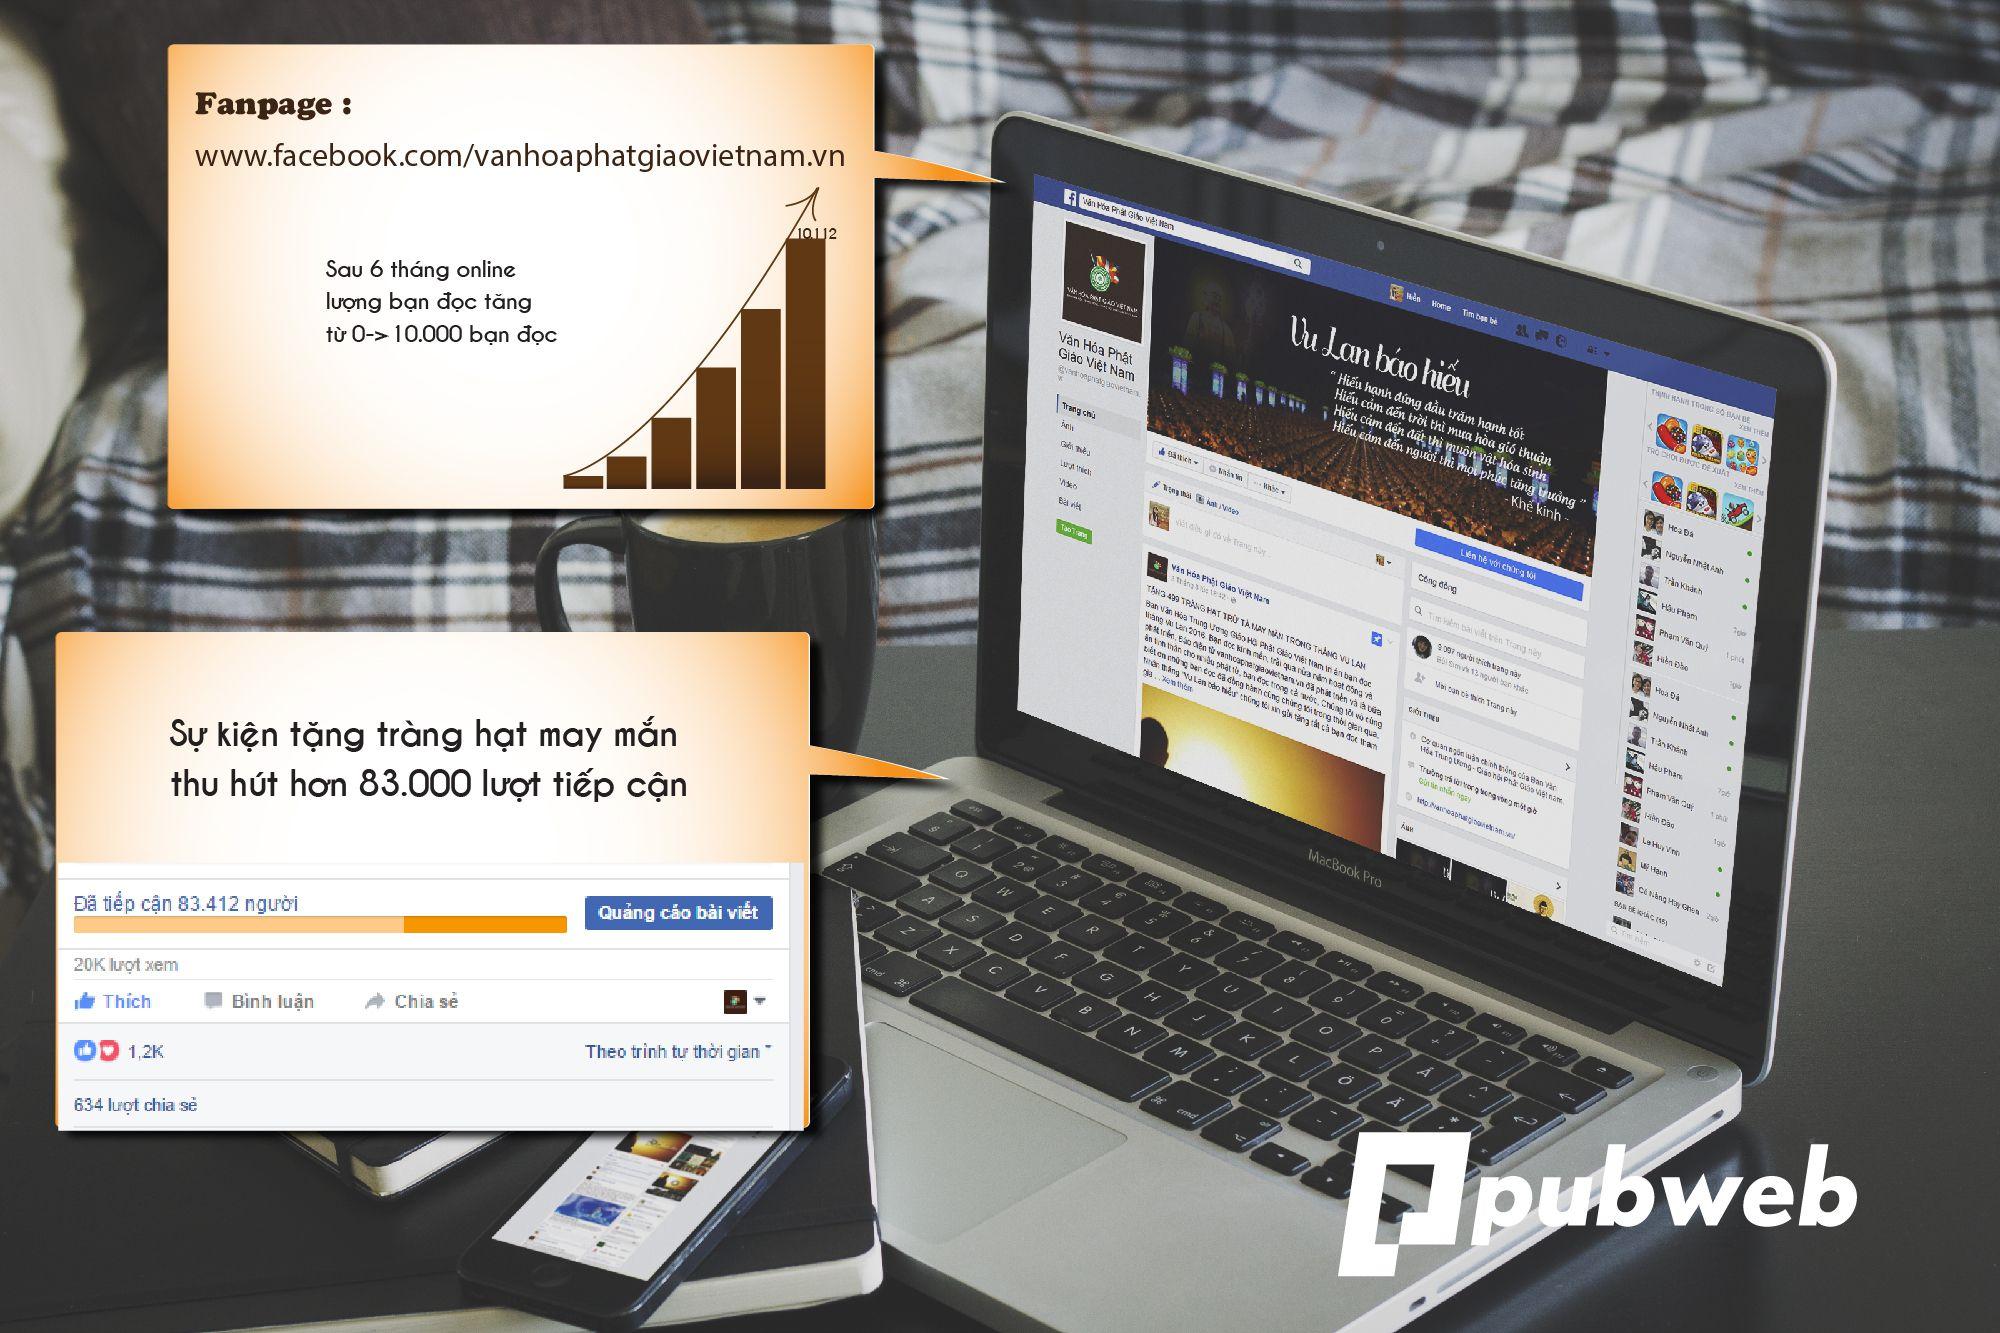 Marketing vanhoaphatgiaovietnam.vn